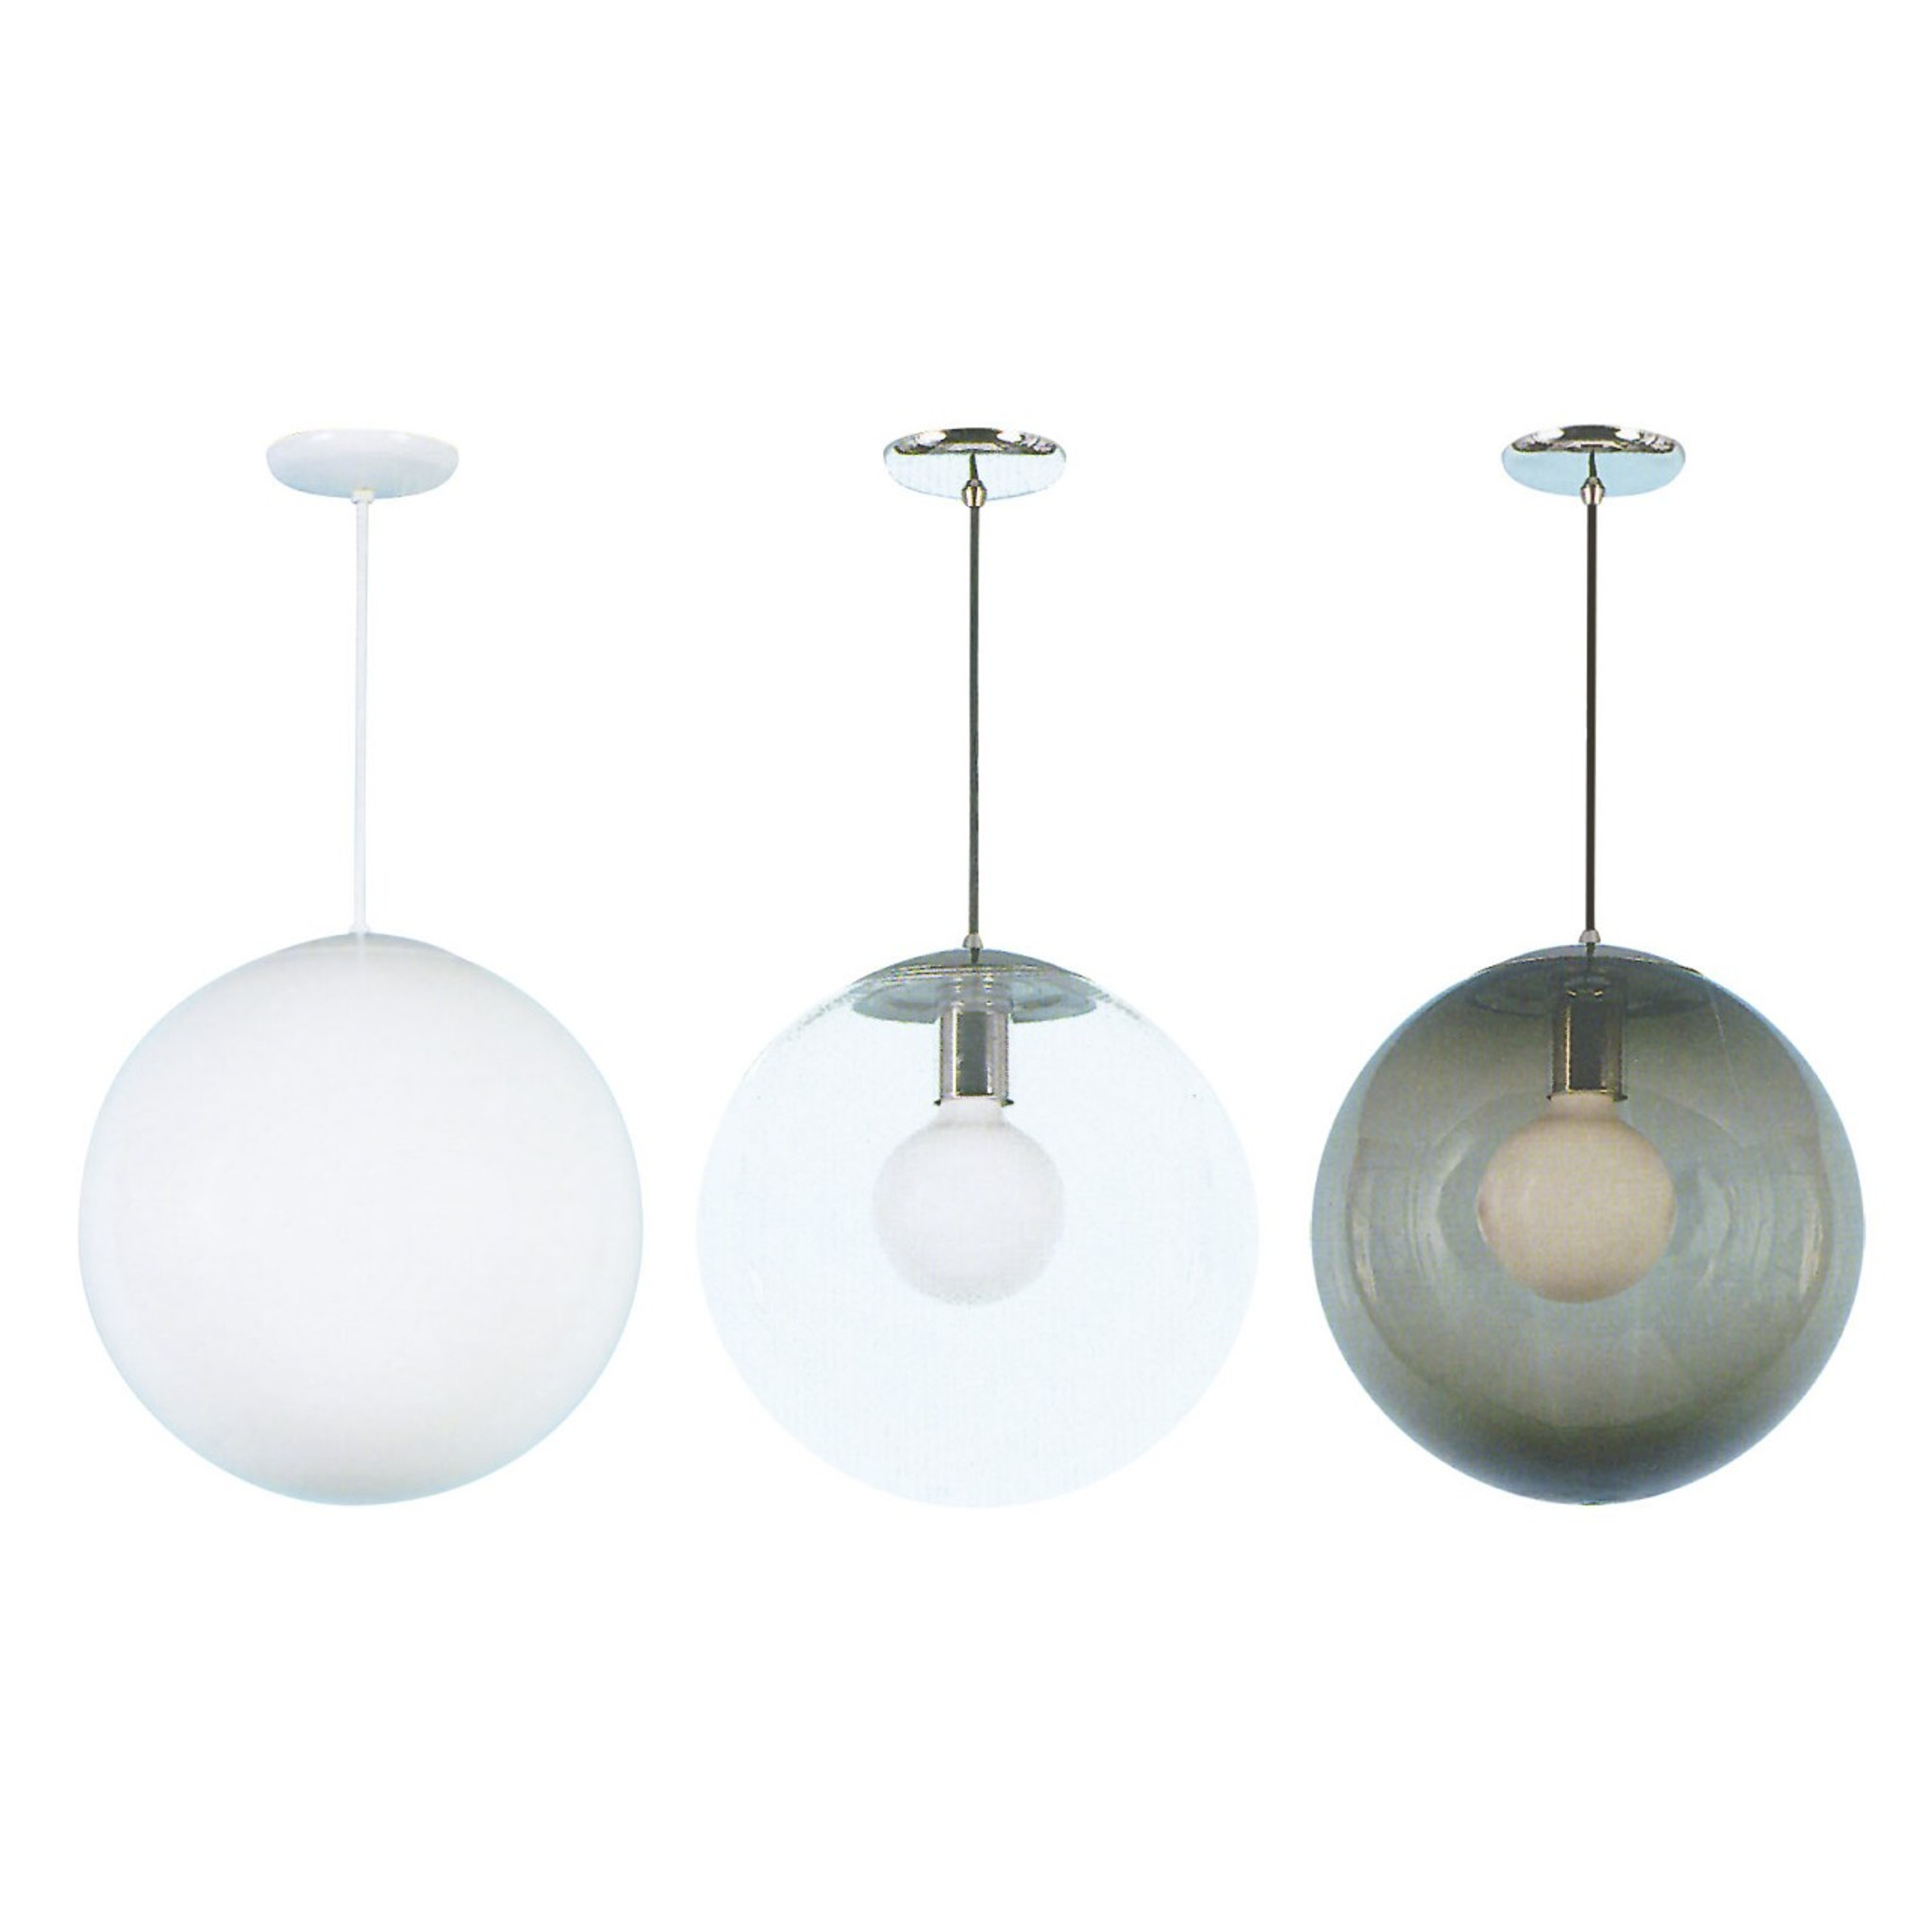 30 inch globe pendant hip haven globe pendant color options aloadofball Gallery